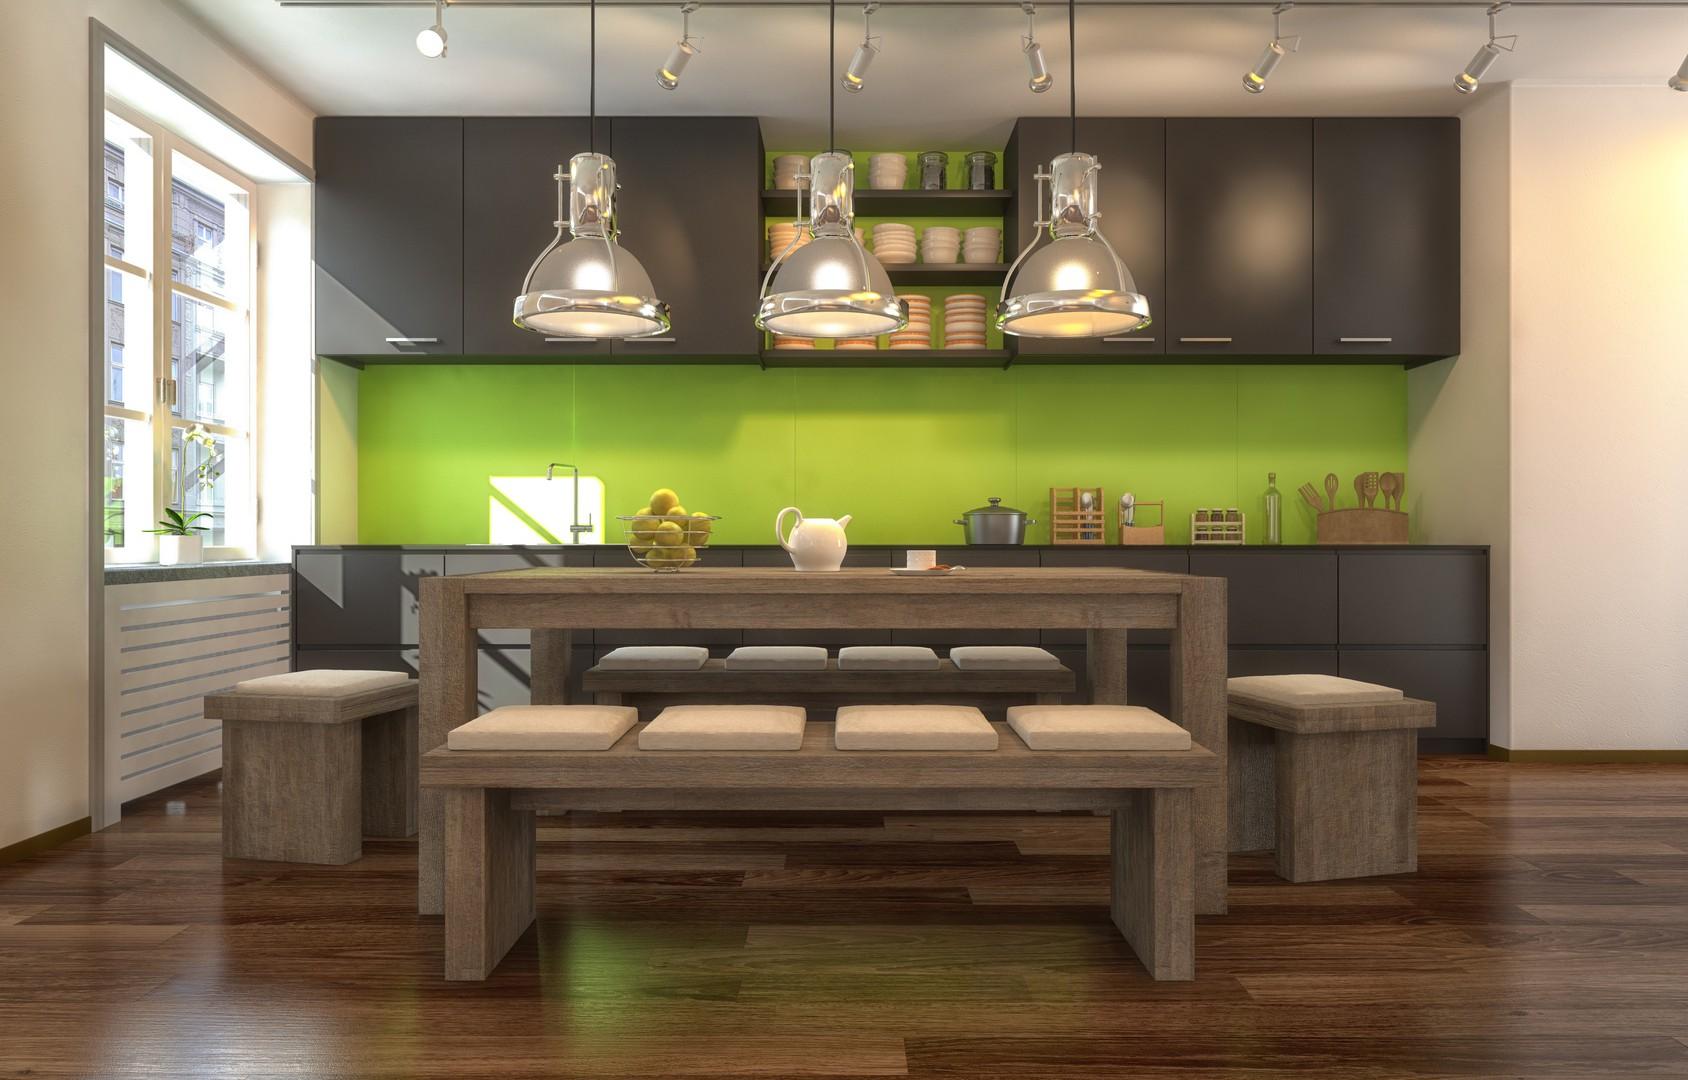 Betaalbare Design Keuken : KeukenXpert Betaalbare Design Keukens ...